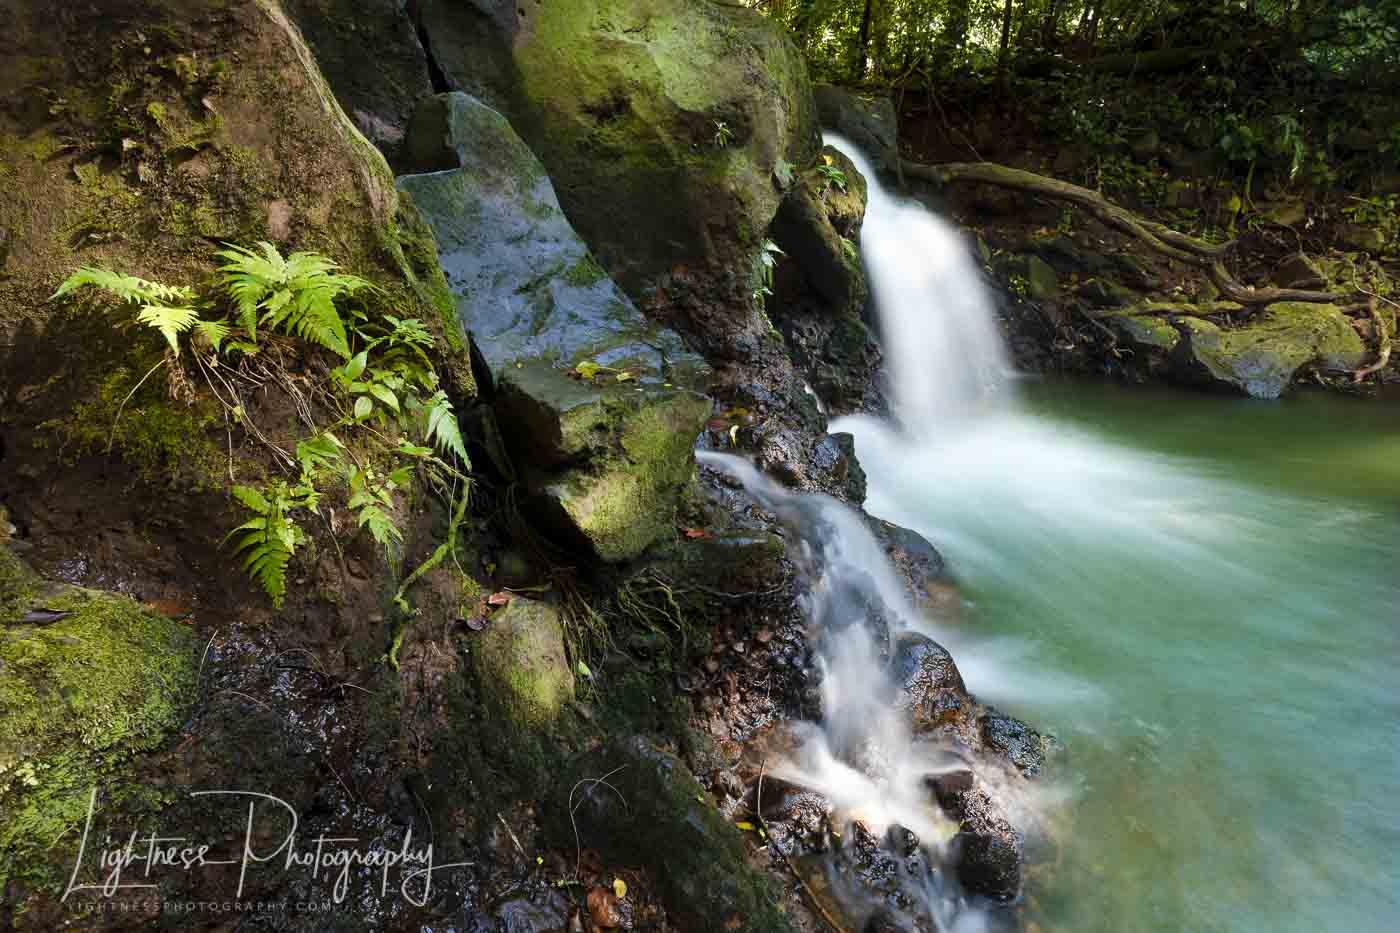 forest-stream-web-0259.jpg